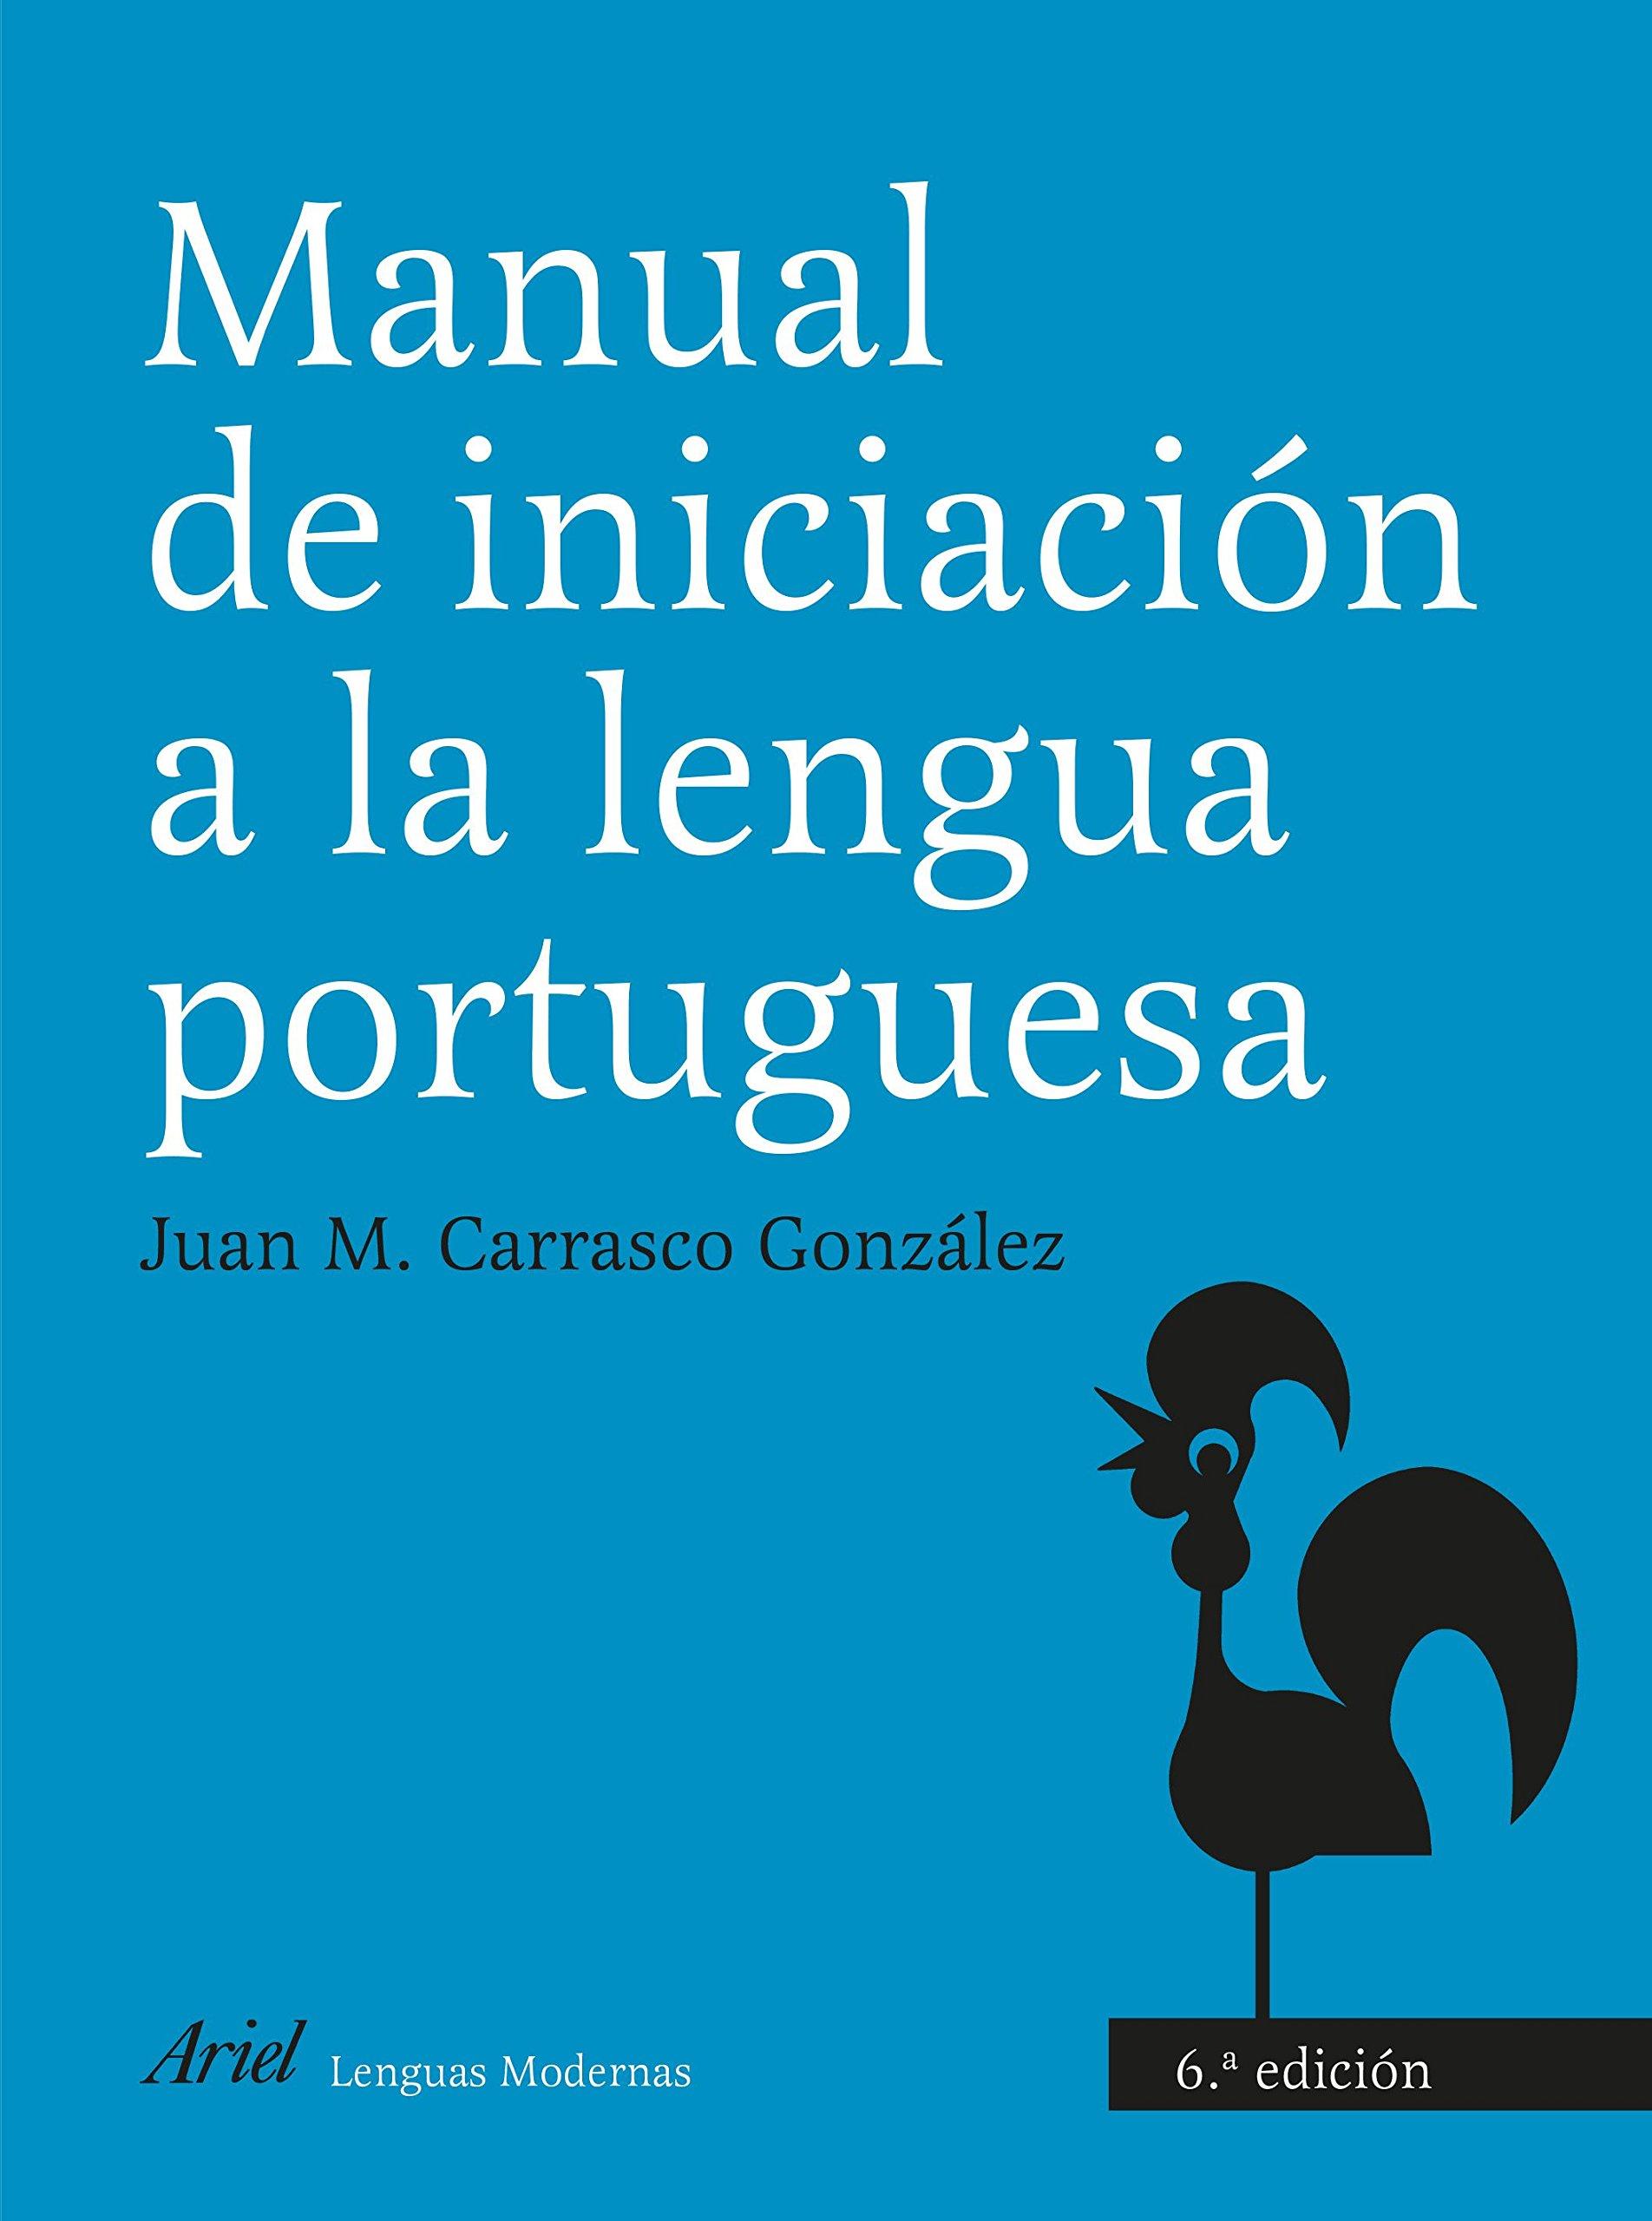 Manual de iniciación a la lengua portuguesa (Ariel Letras) Tapa blanda – 14 jul 2008 Juan M. Carrasco Editorial Ariel 8434481243 LNADS03417